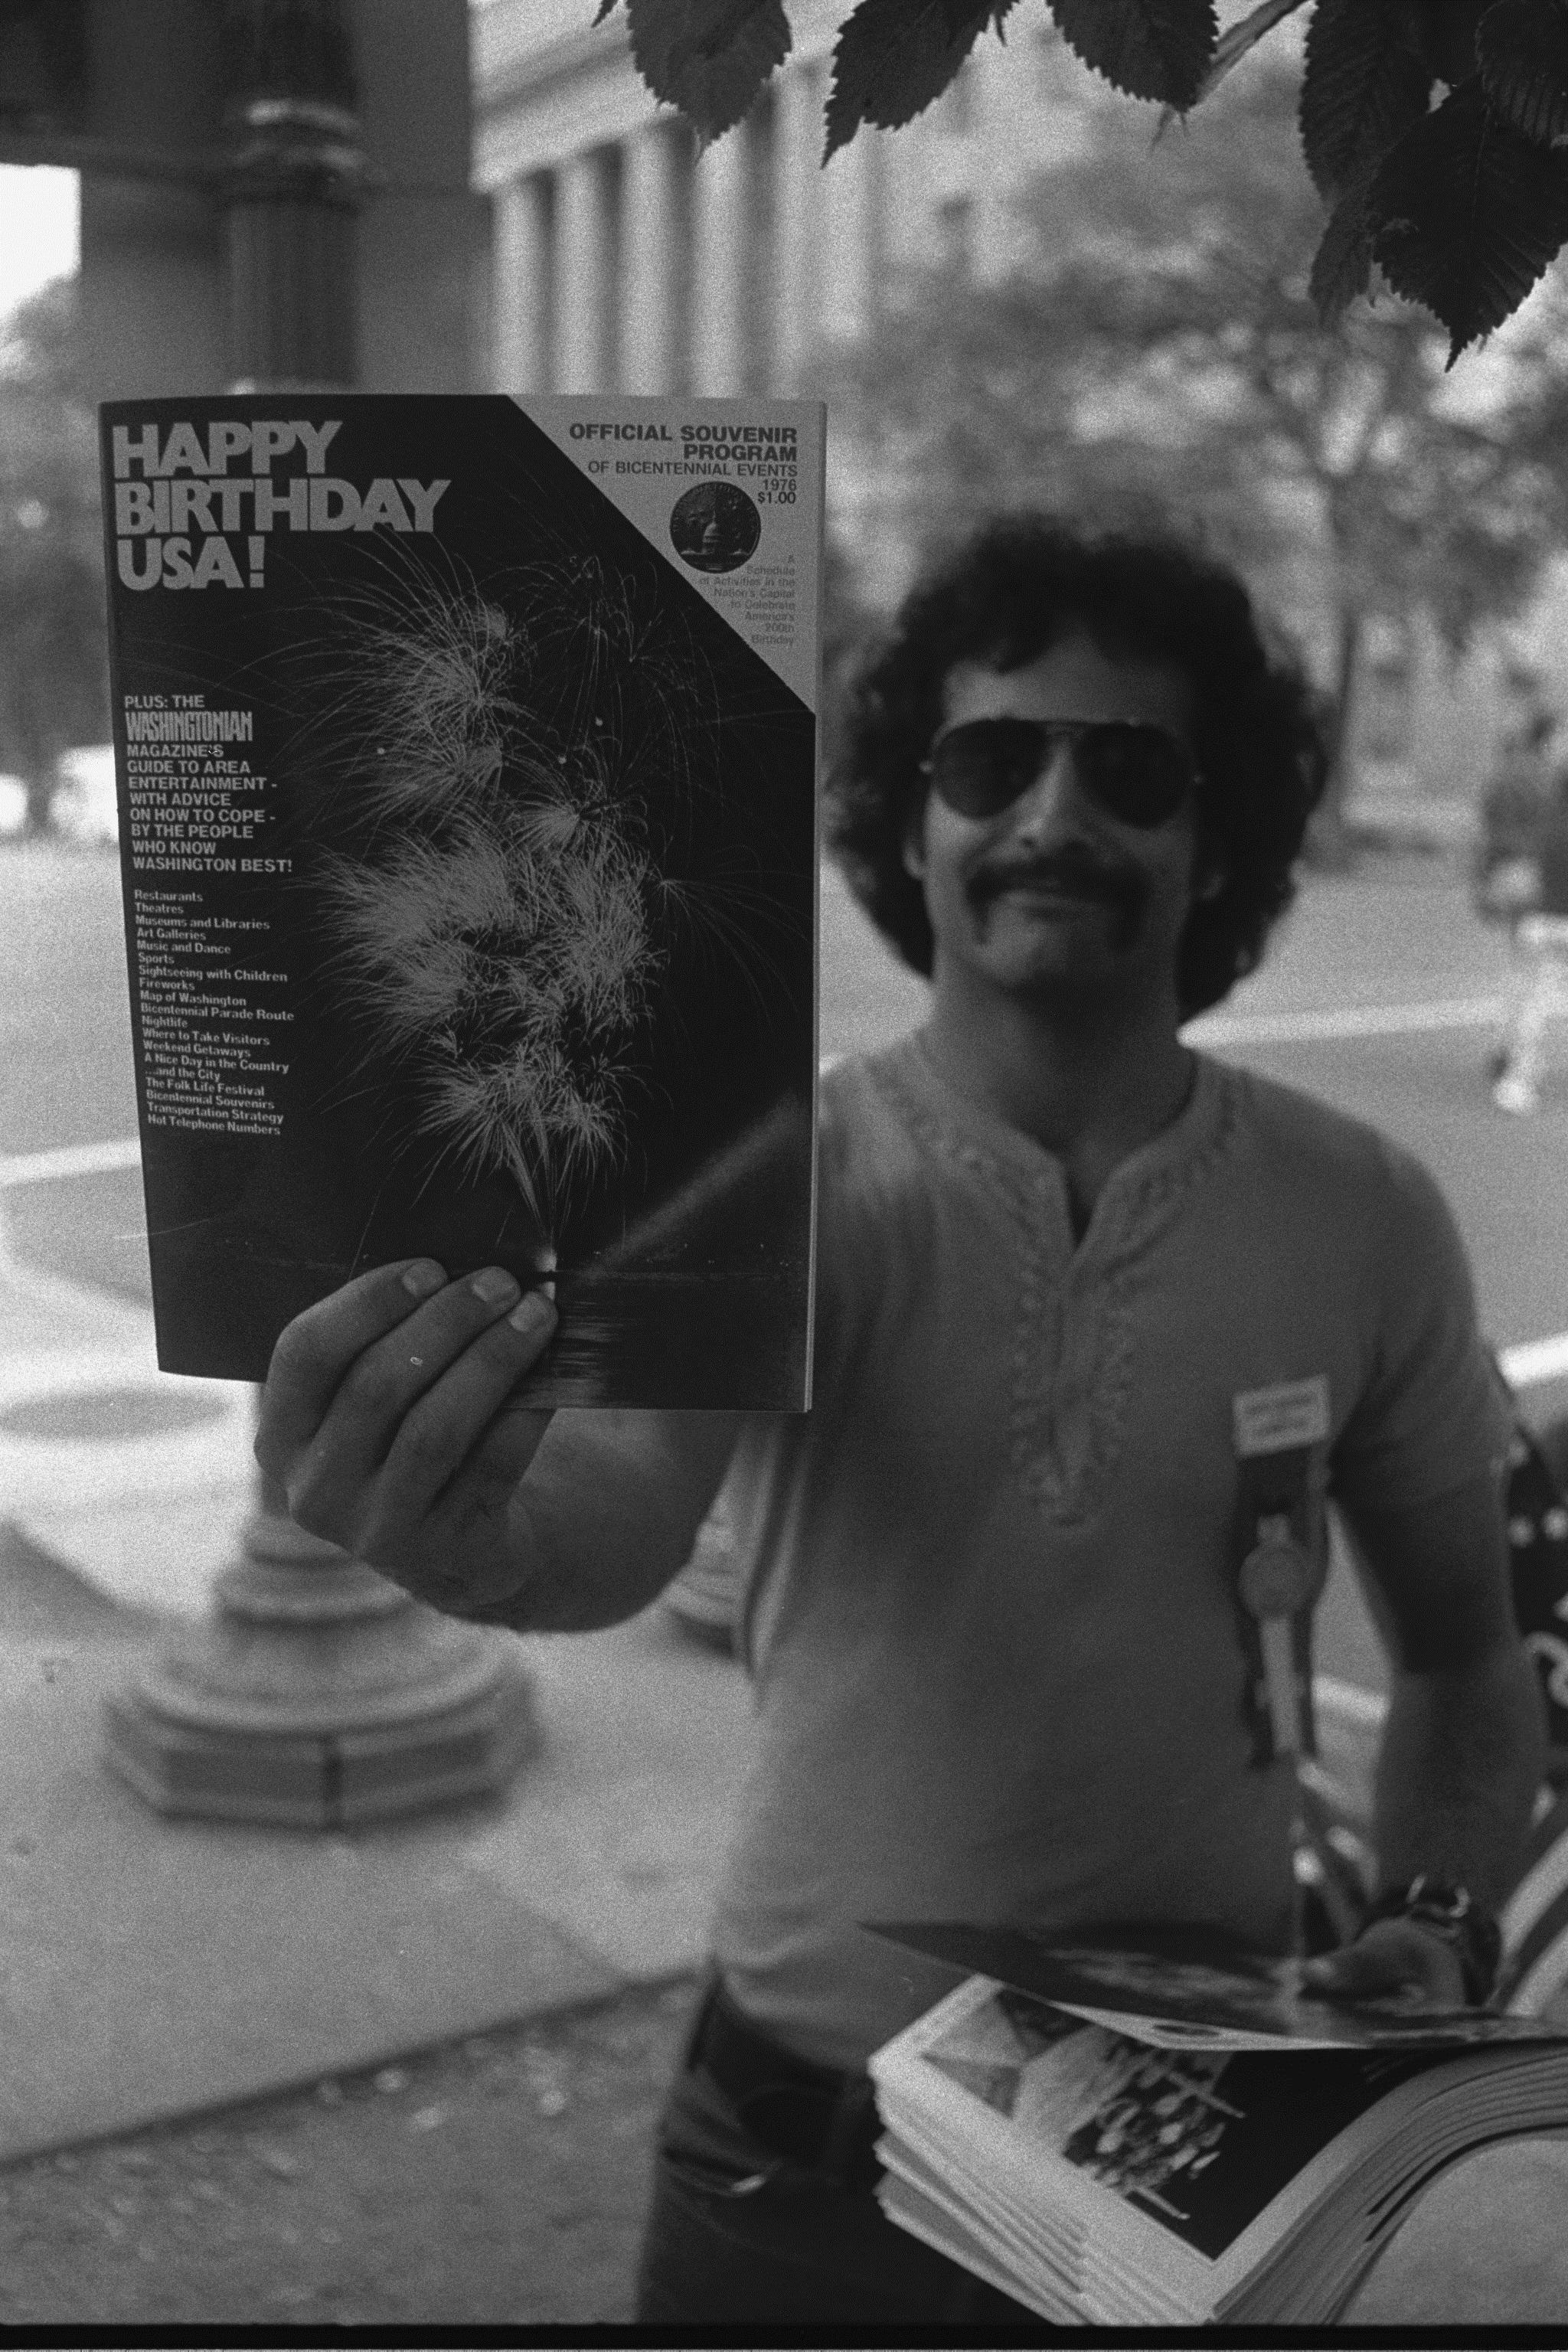 Bicentennial Celebration, 1976